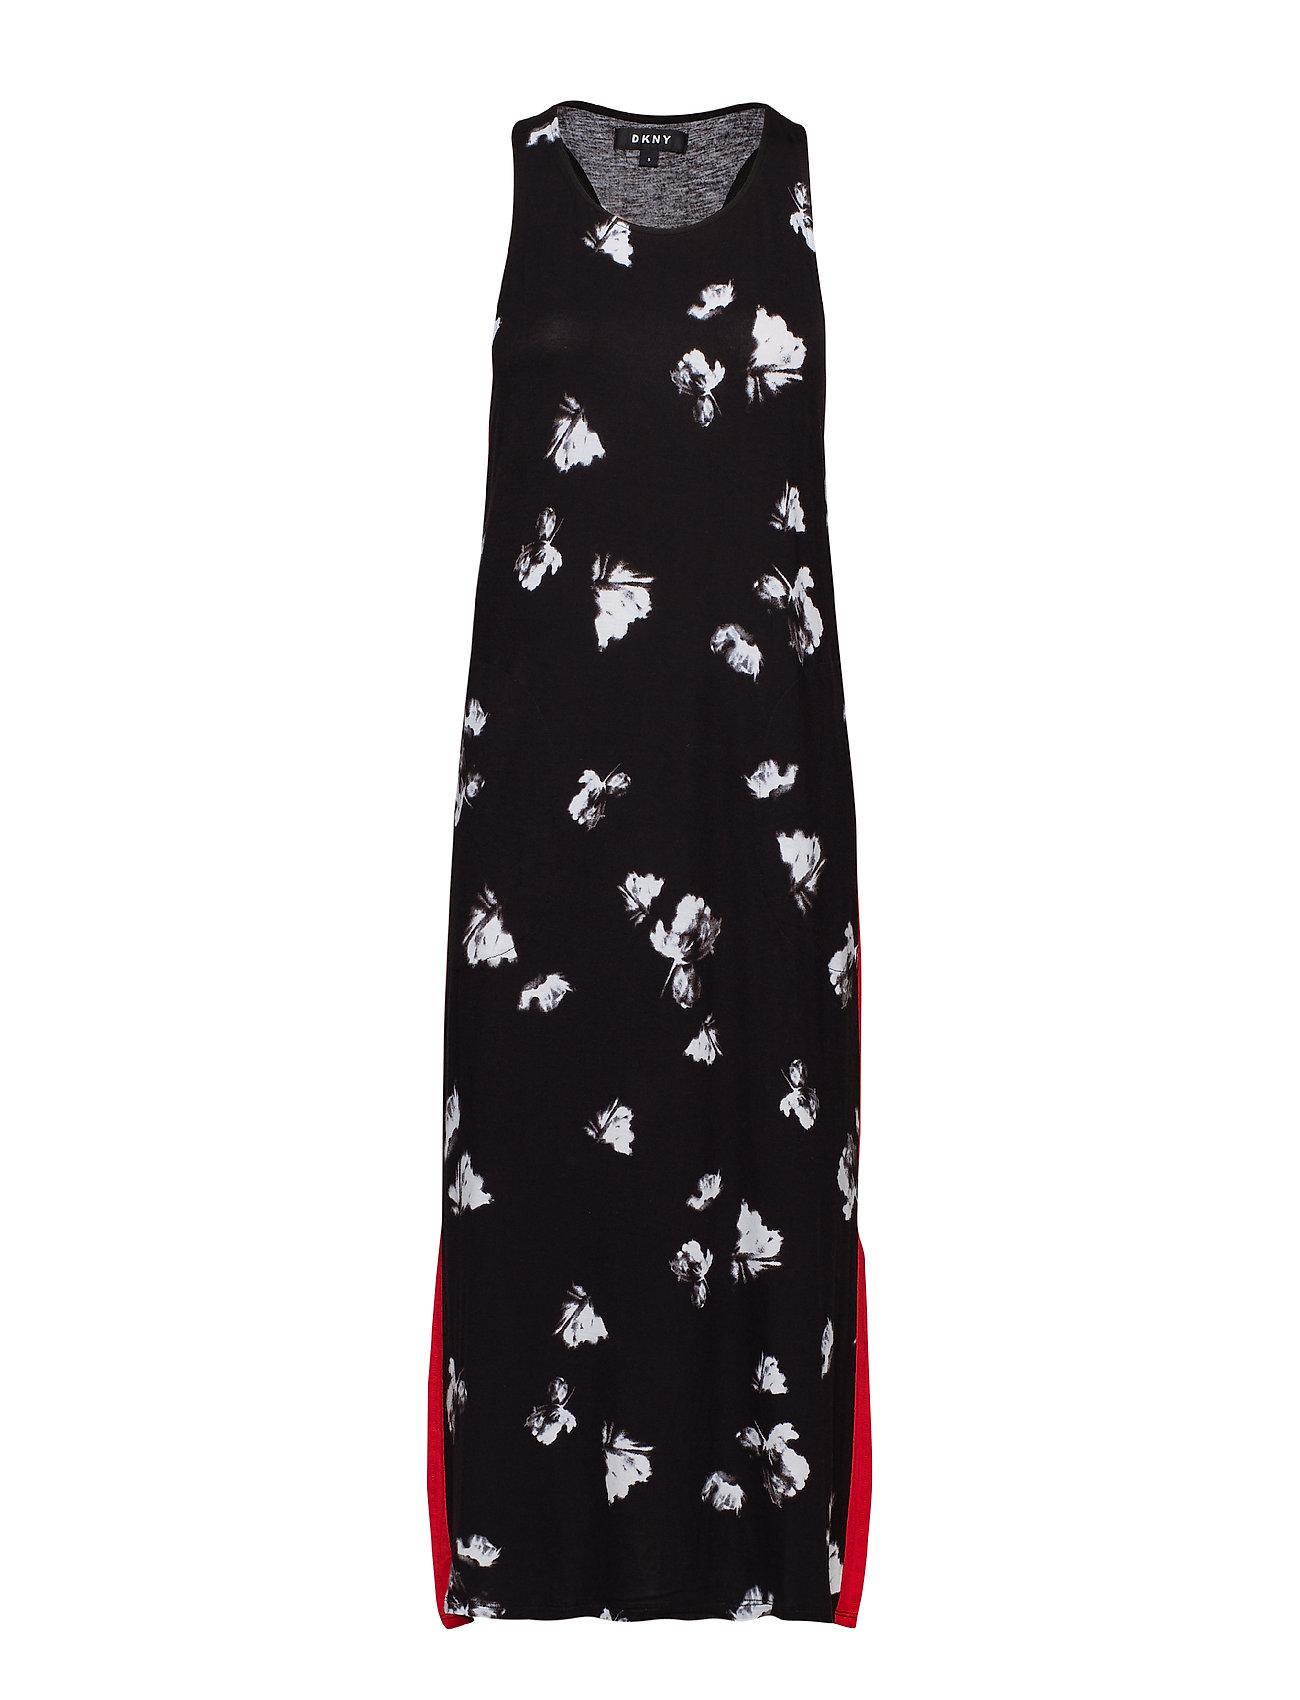 DKNY Homewear DKNY MODERN REFLECTION CHEMISE 122CM - BLACK FLORAL